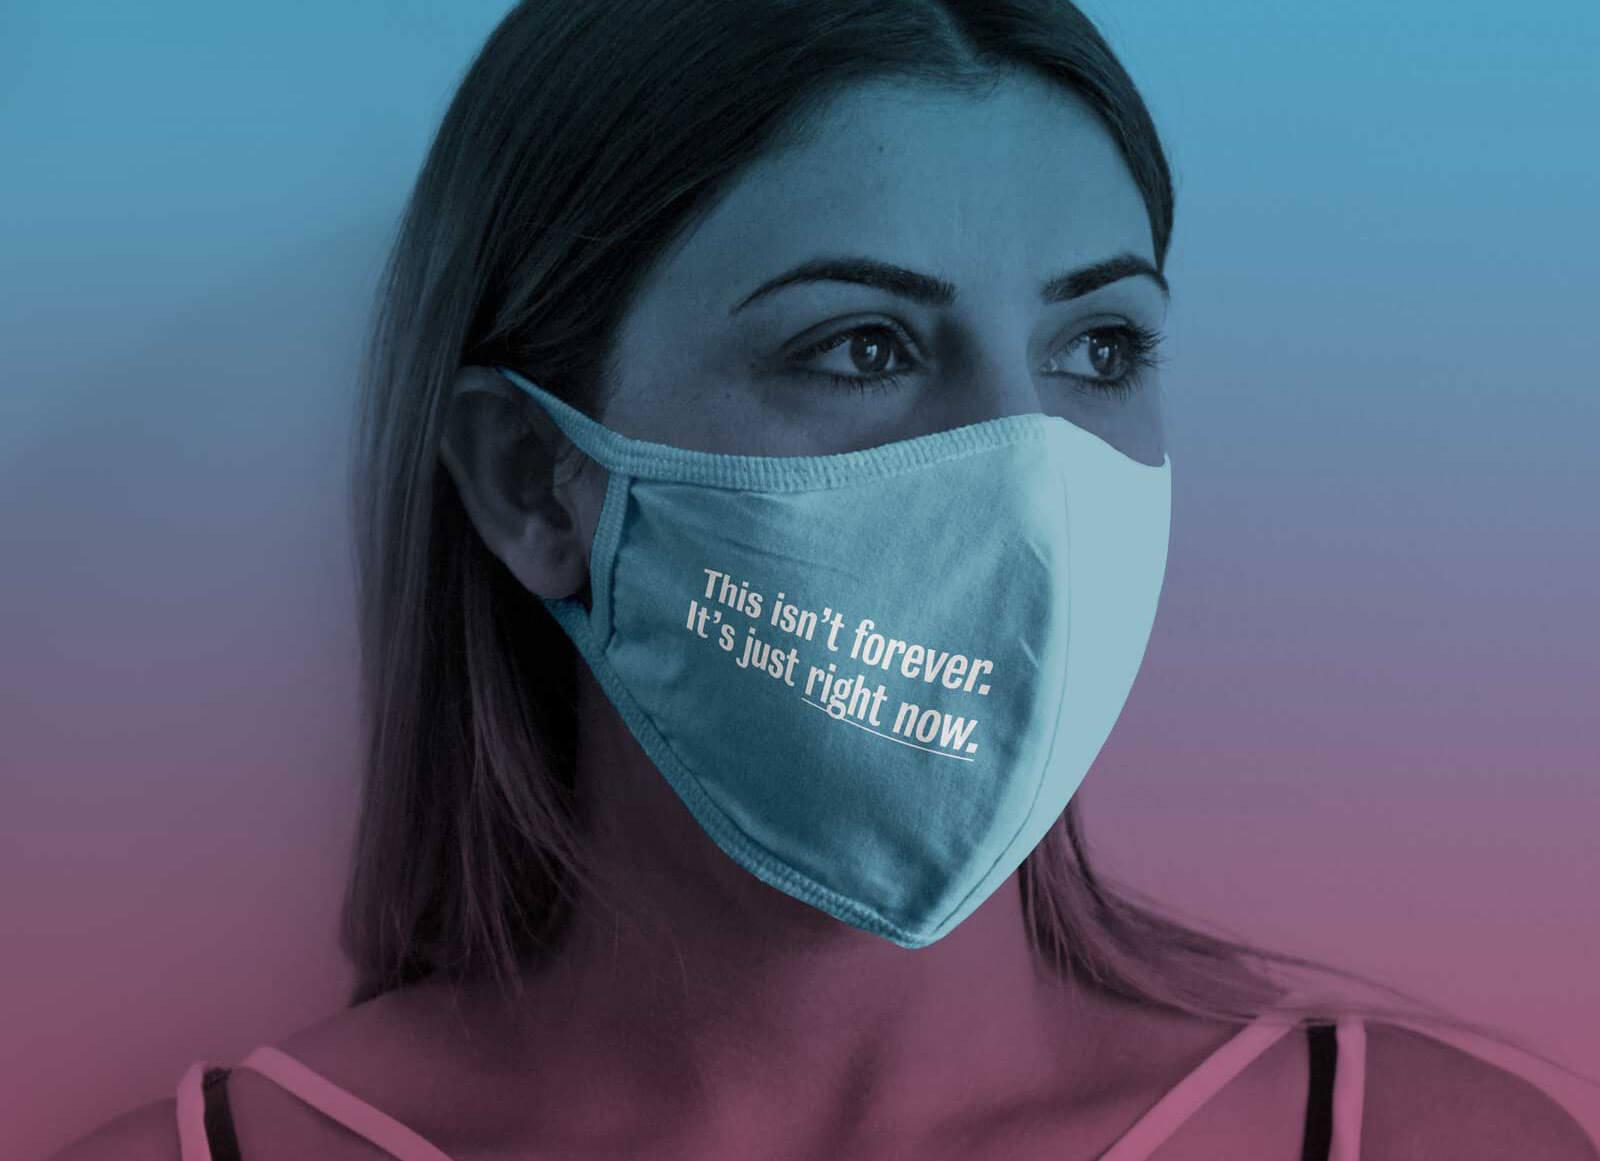 Free-Protective-Cloth-Face-Mask-Mockup-PSD